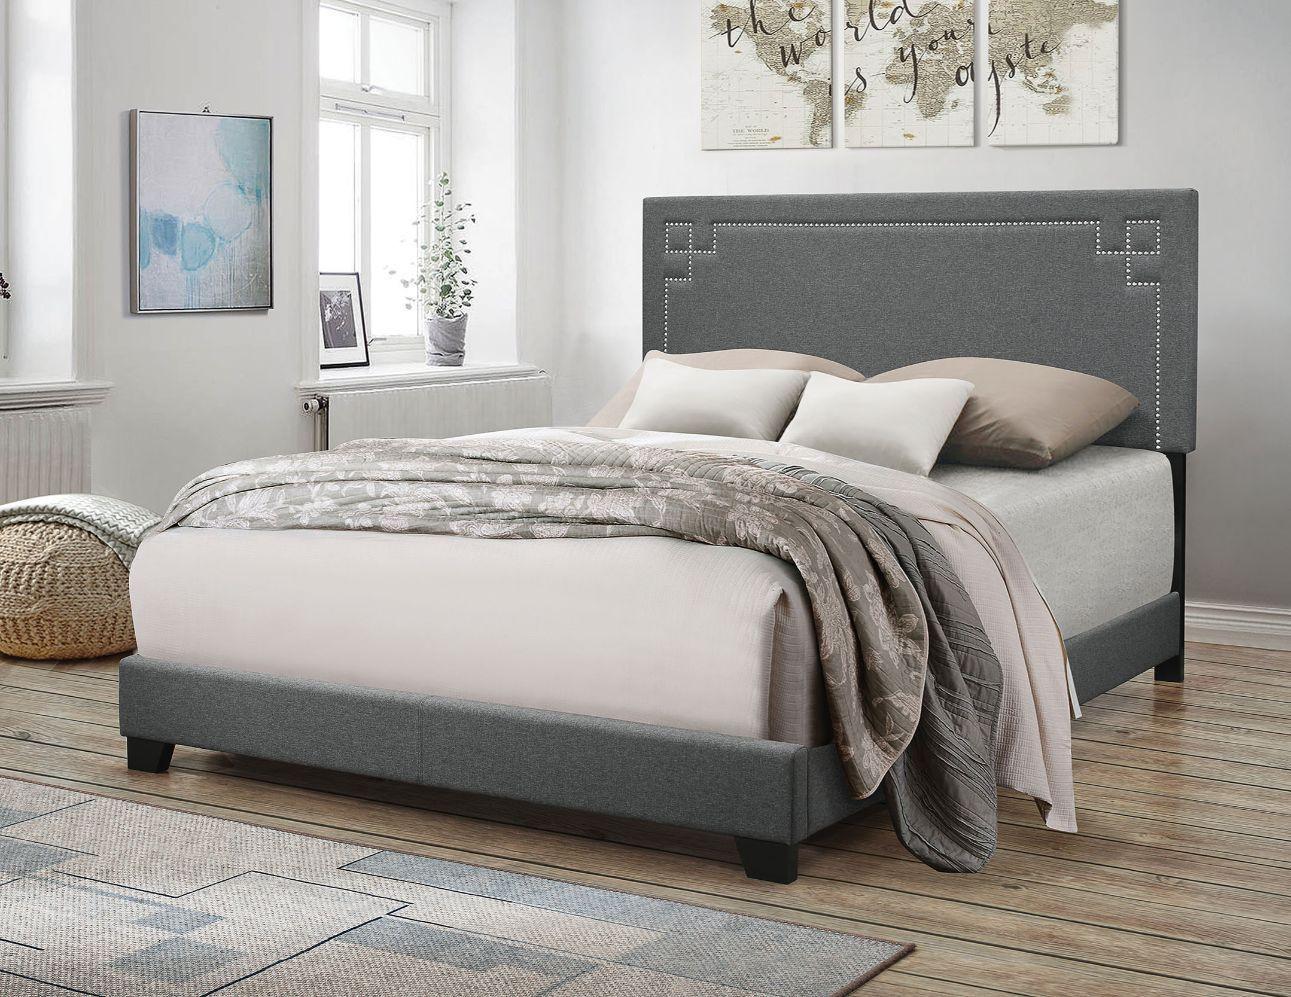 Acme 20910Q Latitude run Ishiko II gray fabric upholstered queen bed frame set